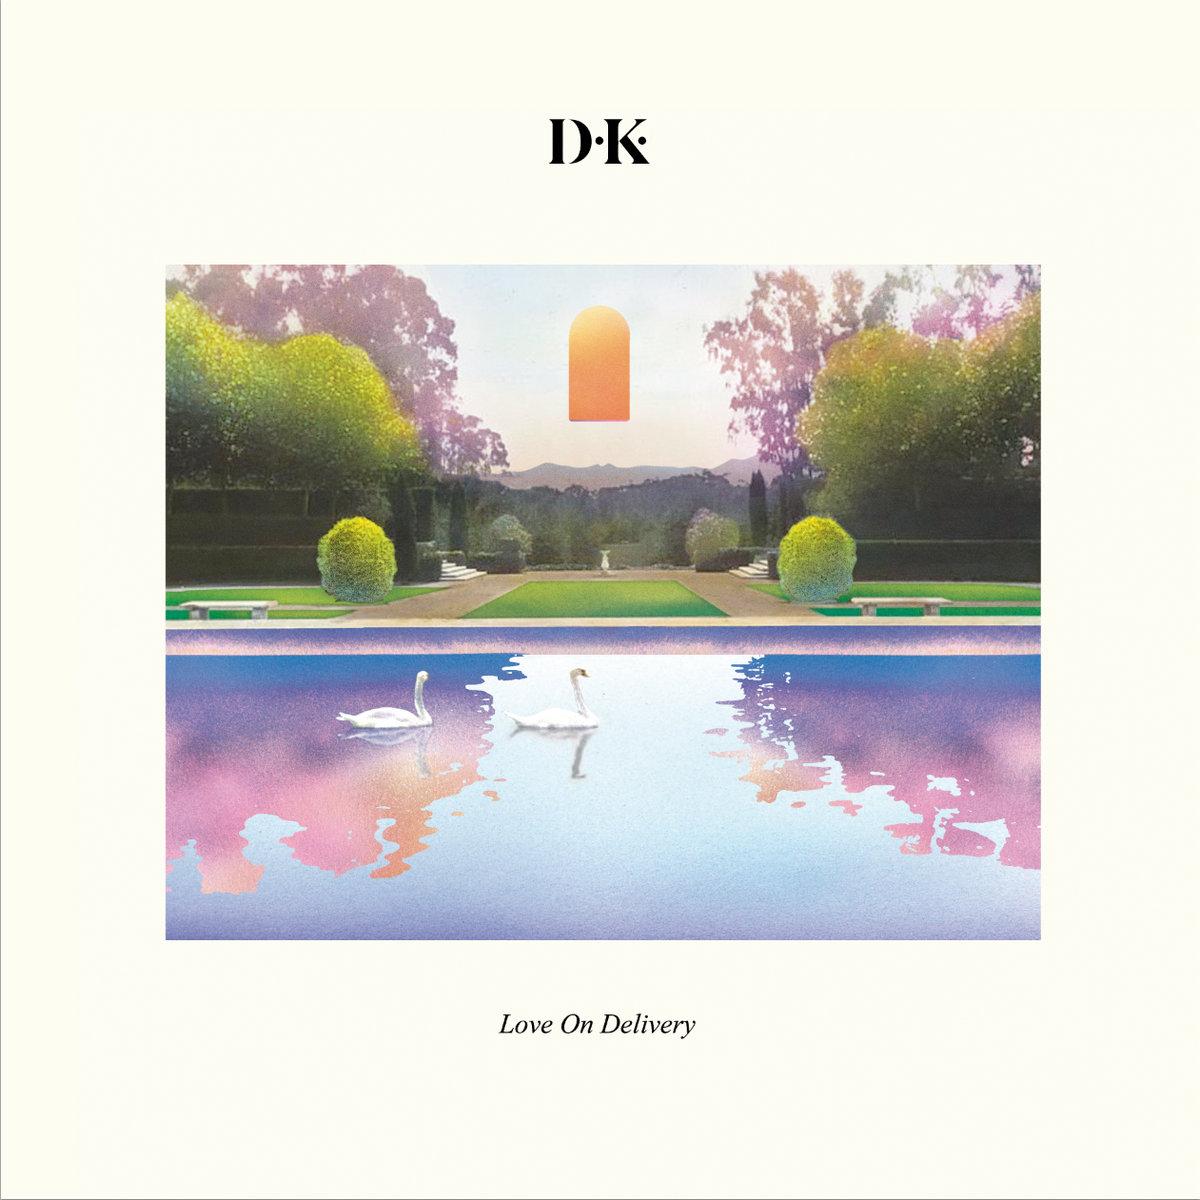 By D K